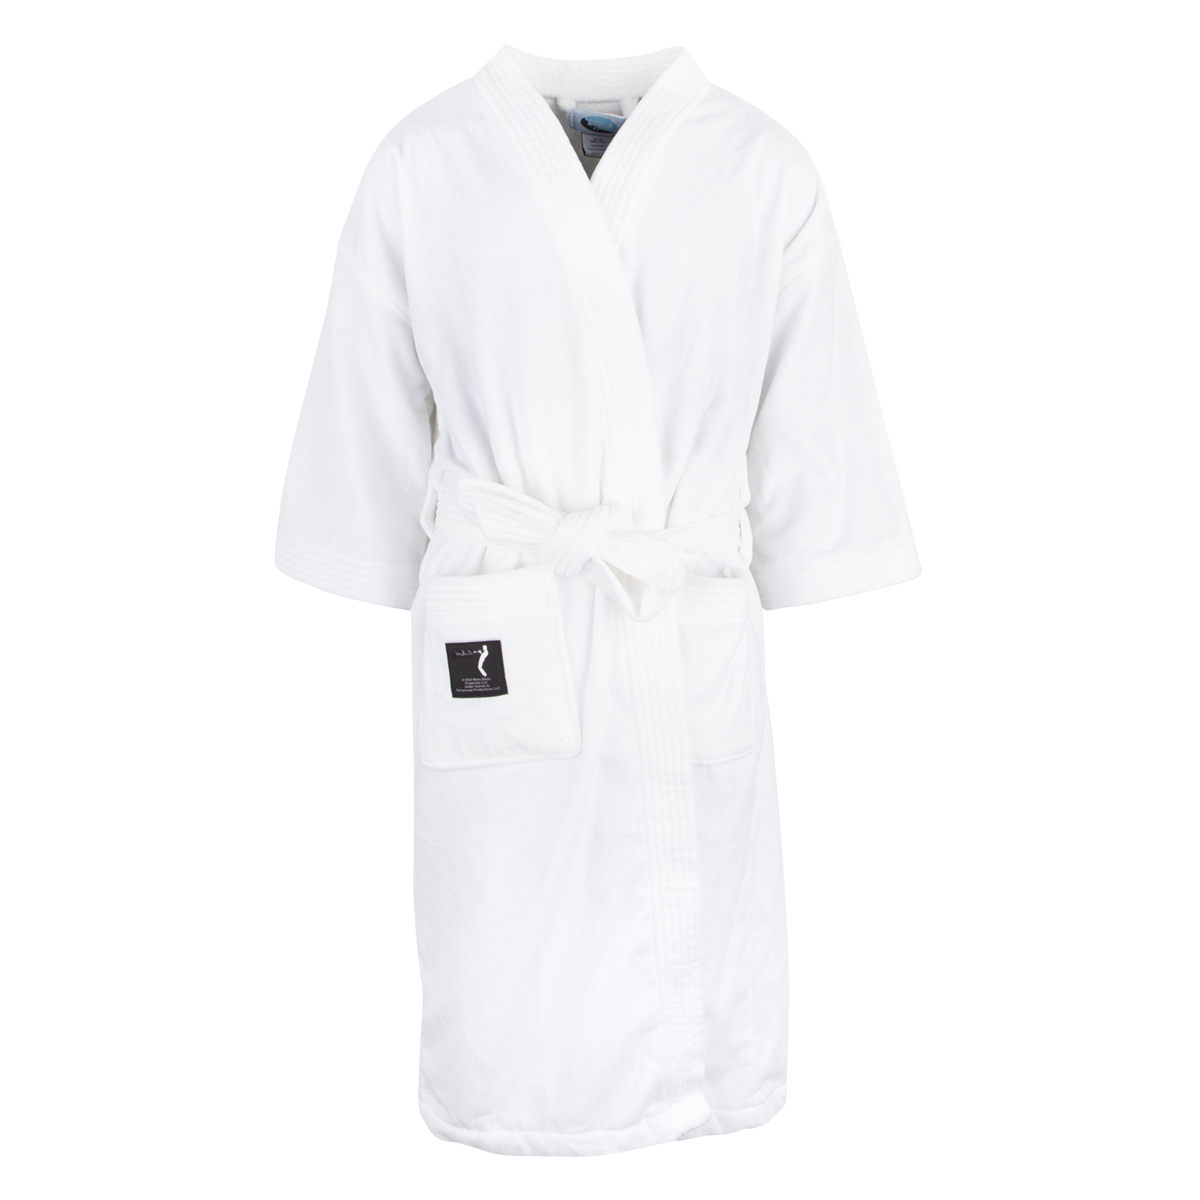 Miles Davis Boxing Robe